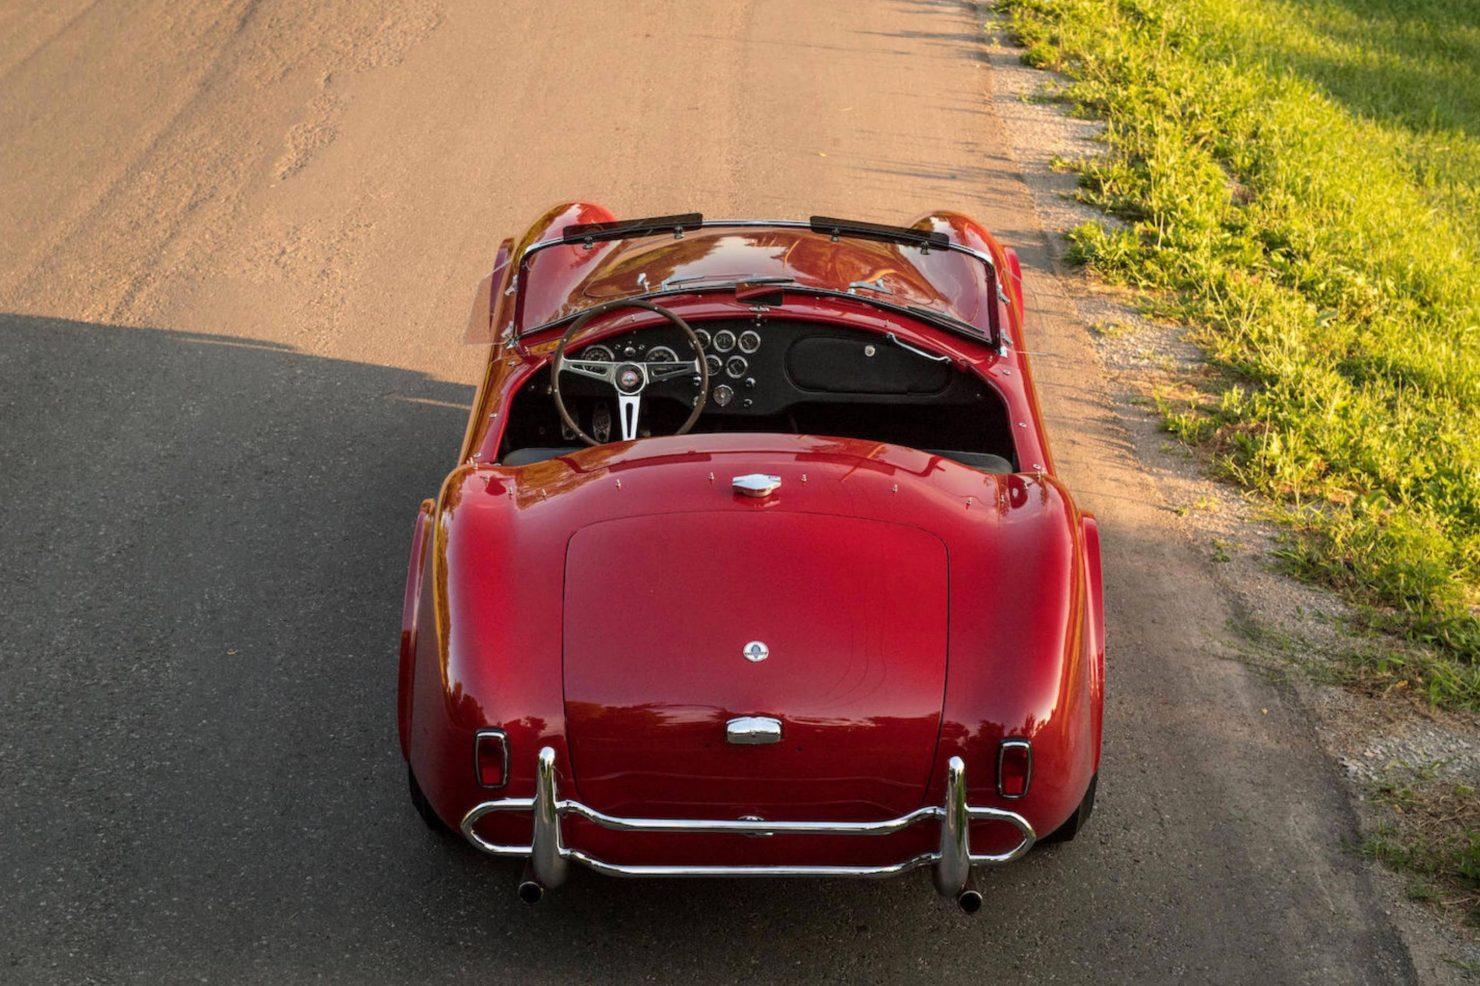 shelby ac cobra 289 28 1480x986 - 1964 Shelby AC Cobra 289